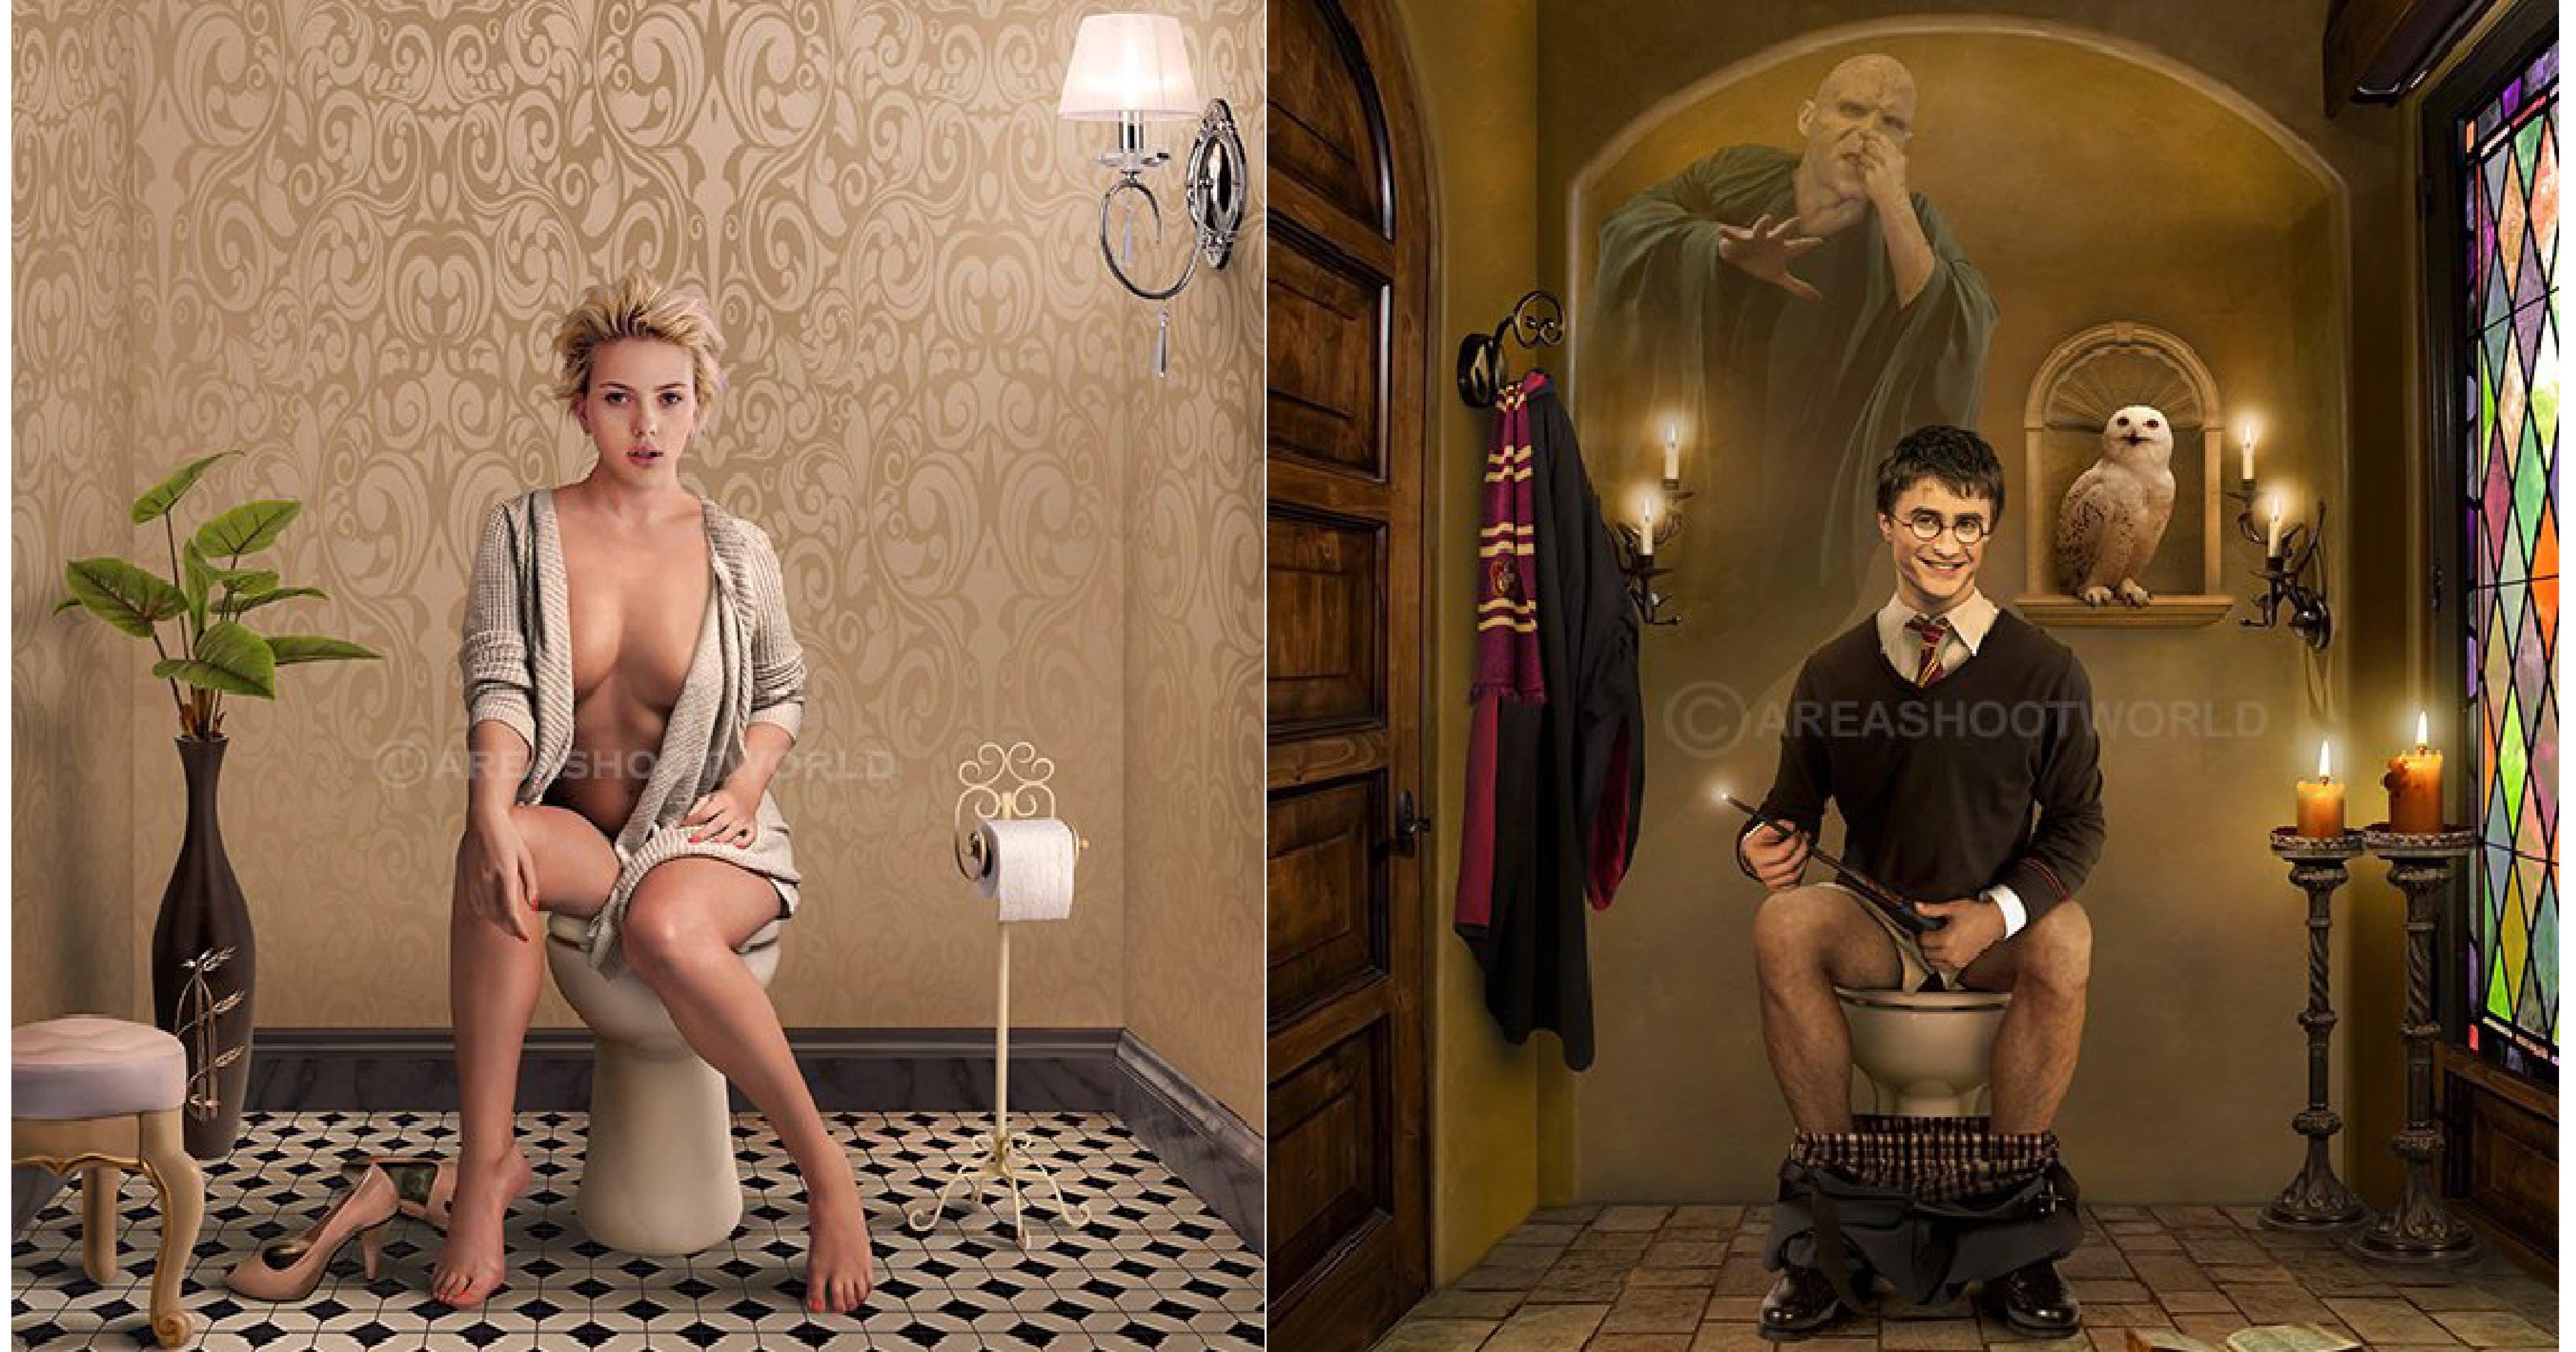 e5b081e99da2 2.png?resize=300,169 - 「名人如廁照」外流?好萊塢大咖、英國王室成員全中鏢...